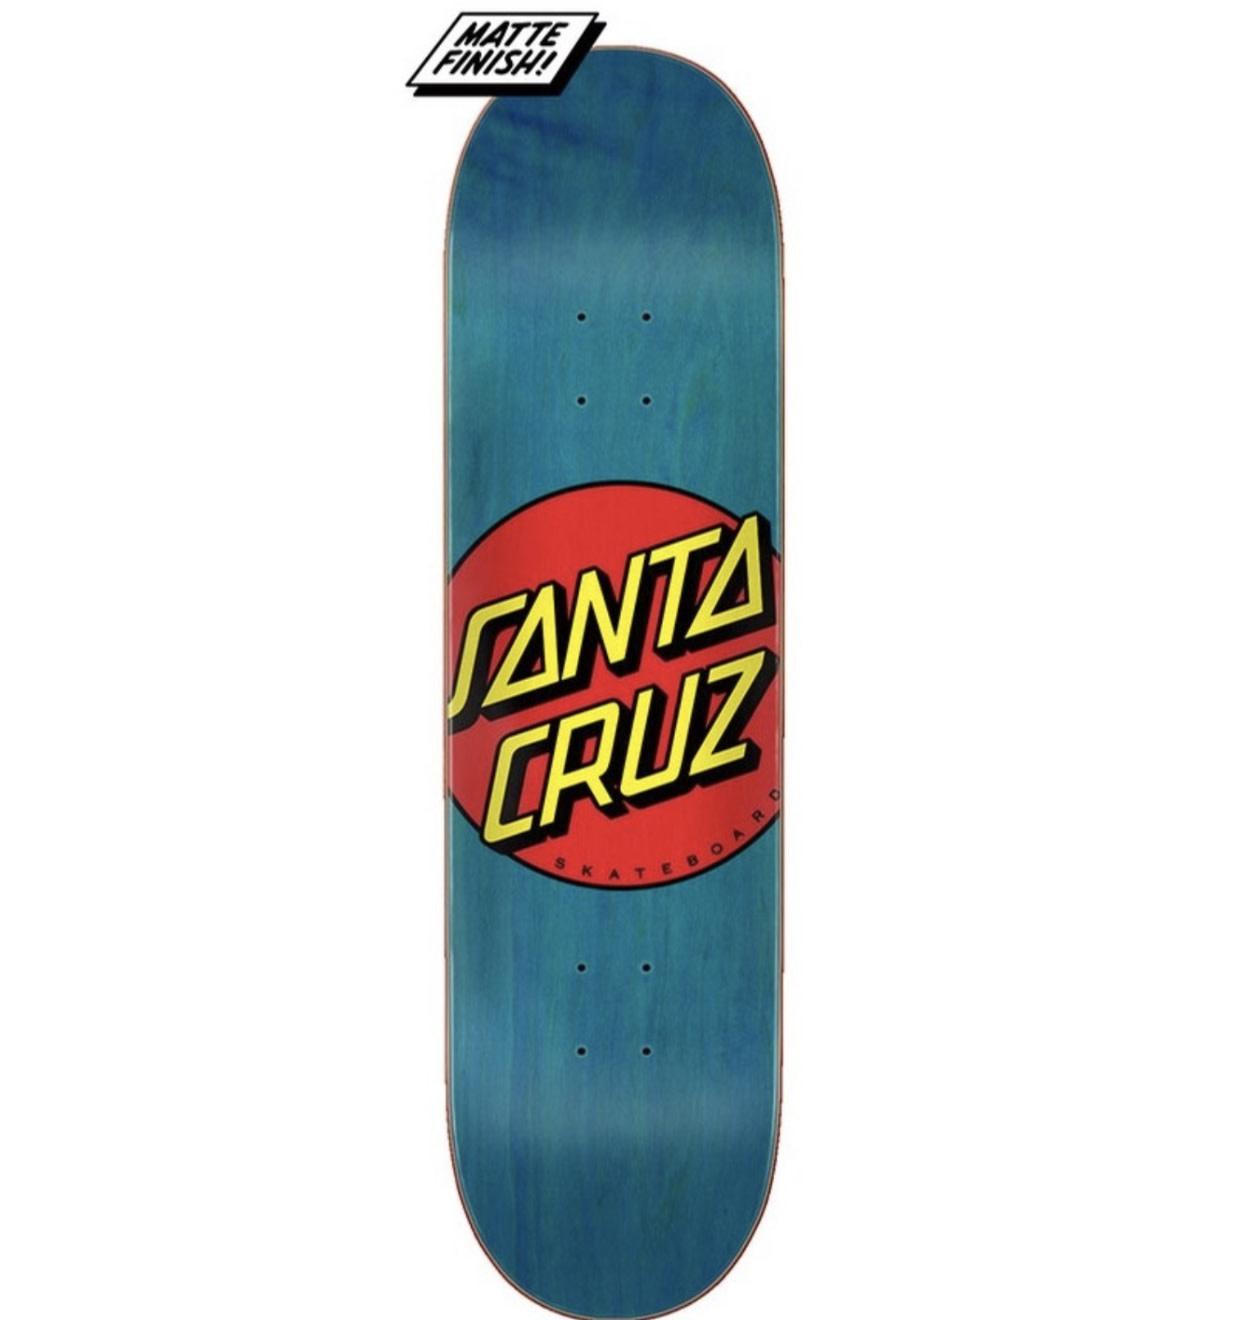 Santa Cruz Santa Cruz - 8.5 Classic Dot